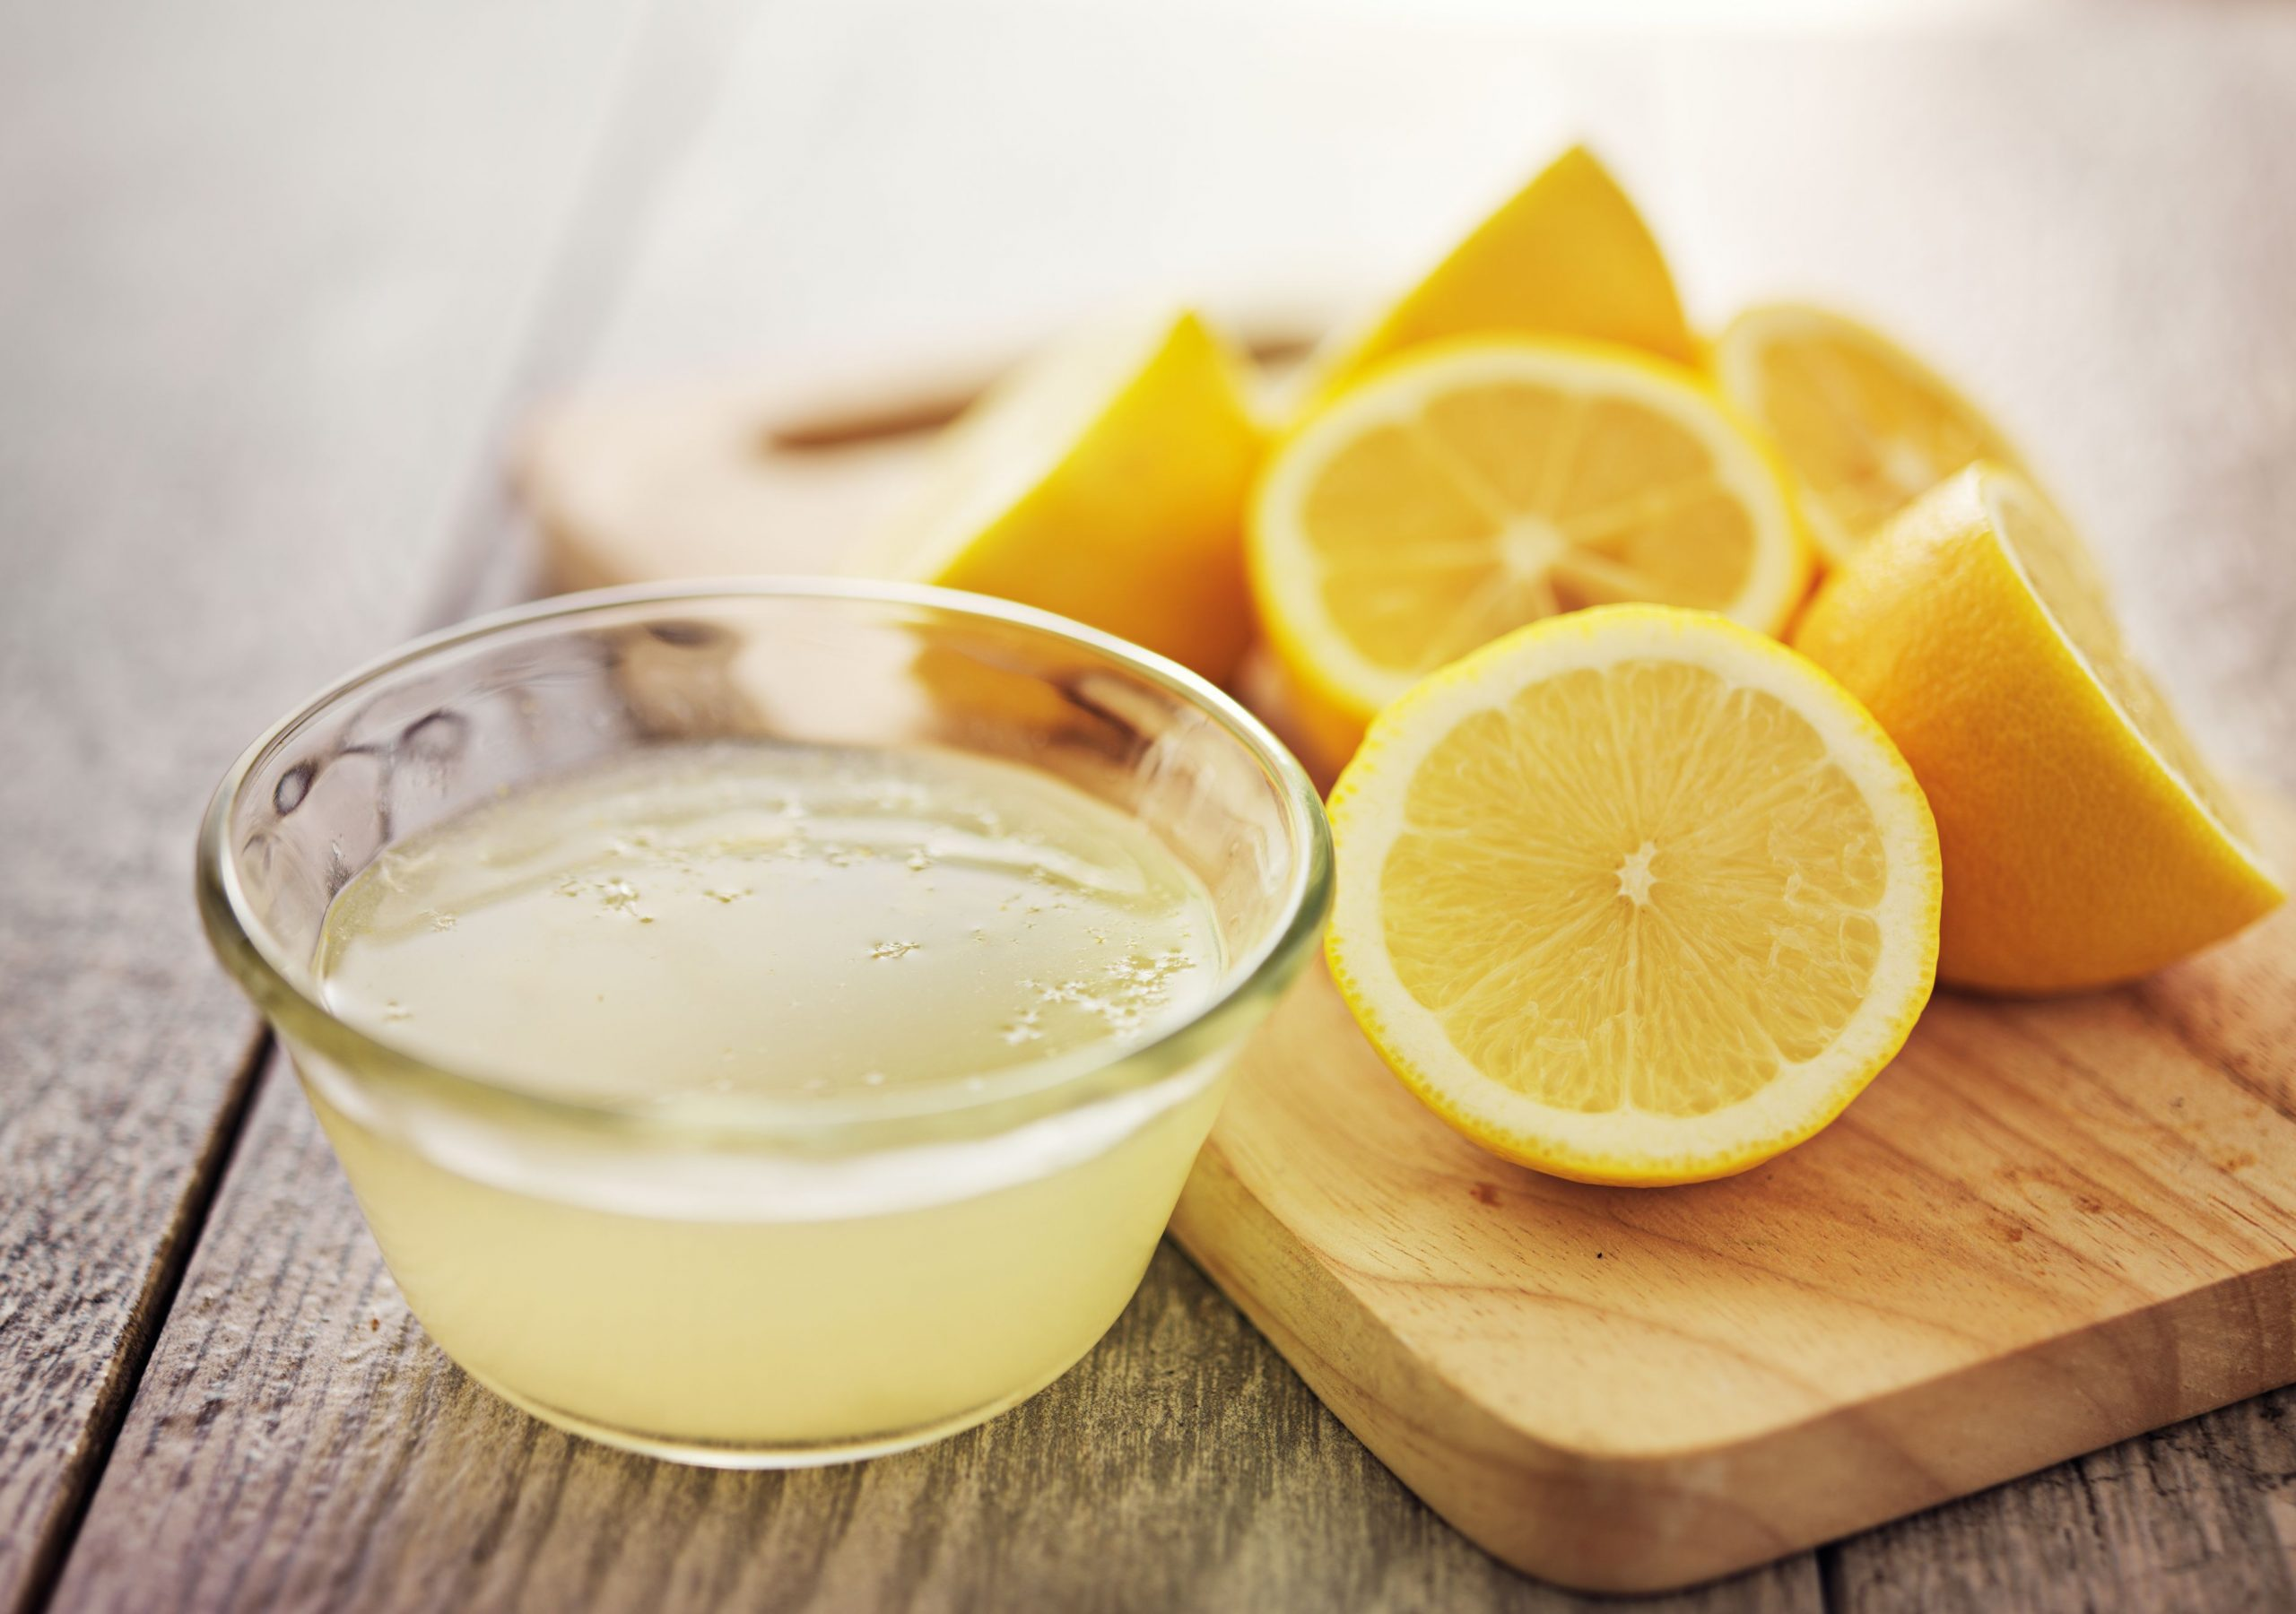 Lemon Juice Remedies for Oily Skin